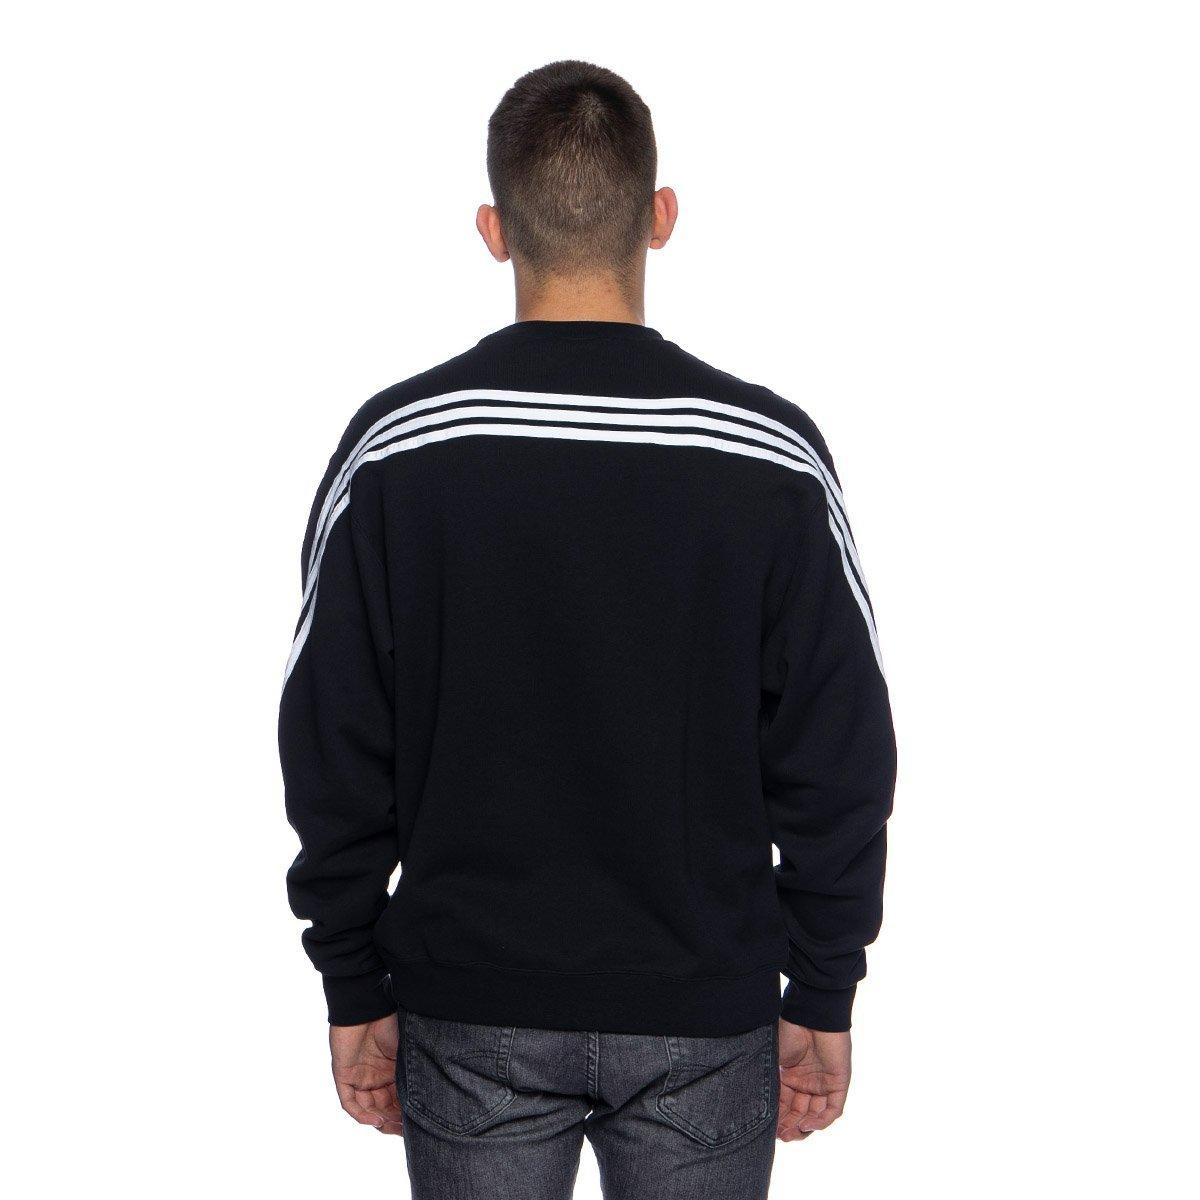 Bluza Adidas Originals 3 Stripes Wrap Crew Sweatshirt blackwhite